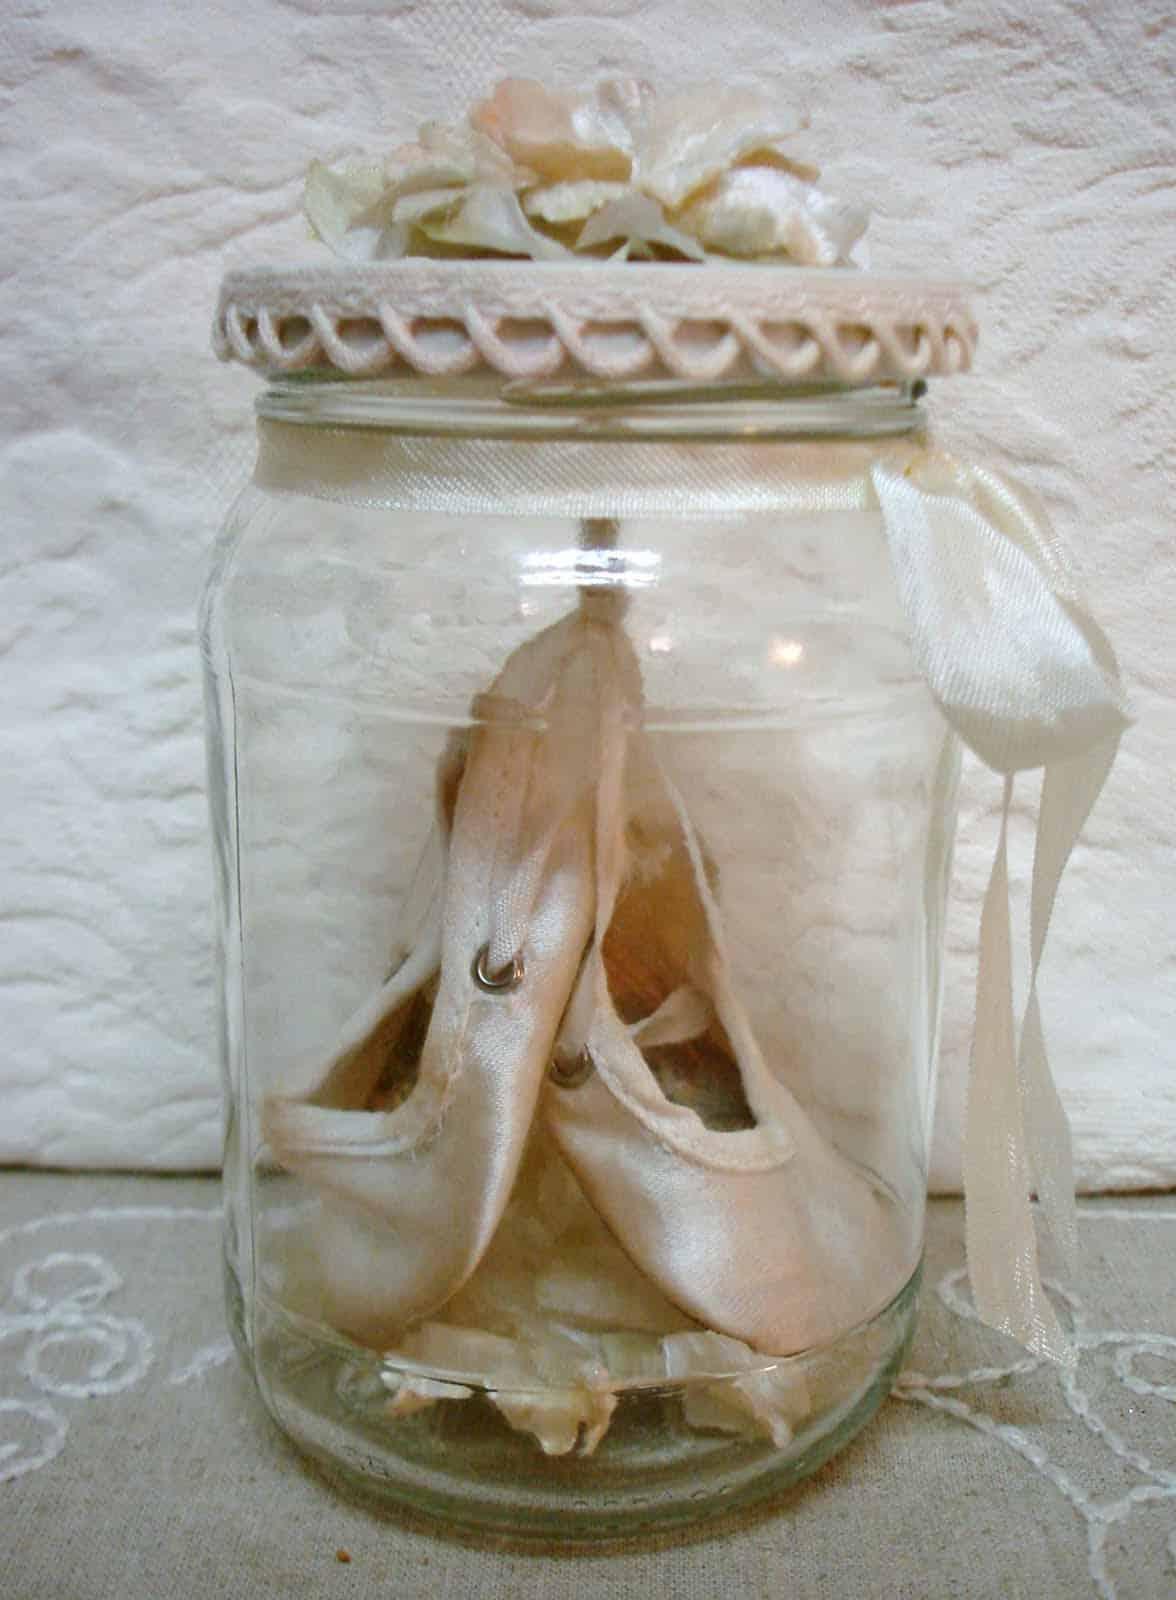 Ballet slippers in a pretty jar